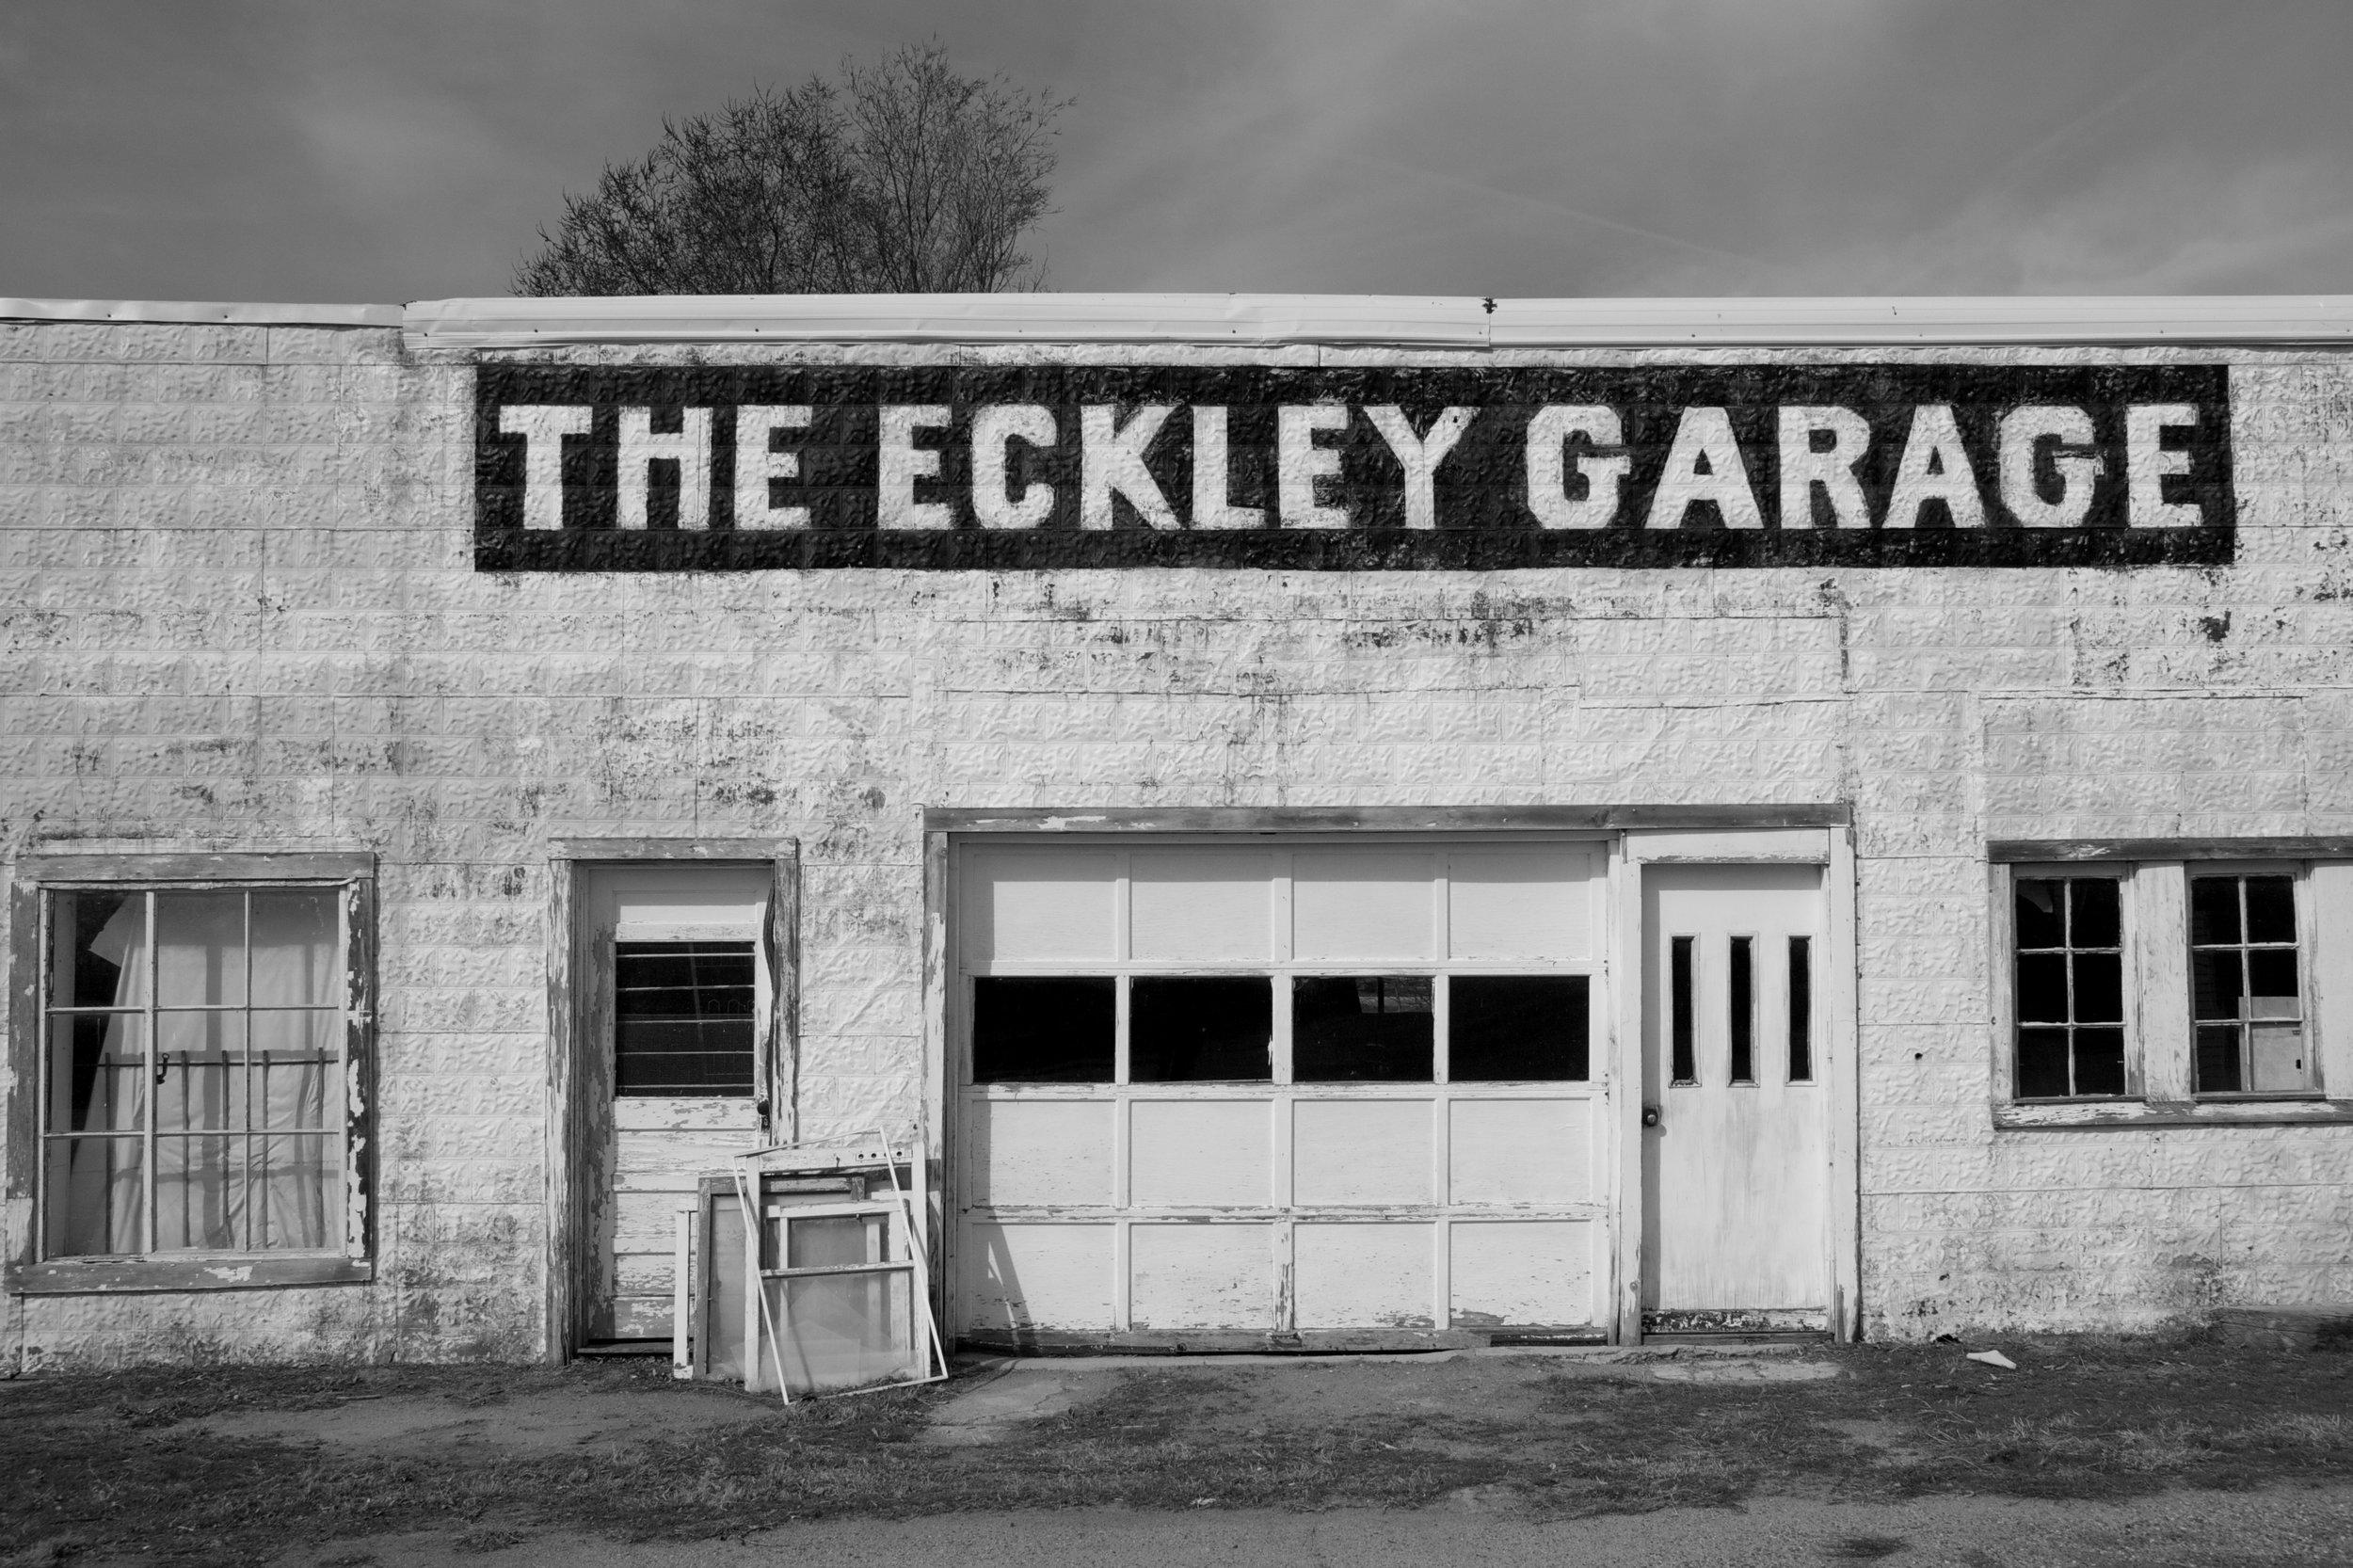 Eckley Garage